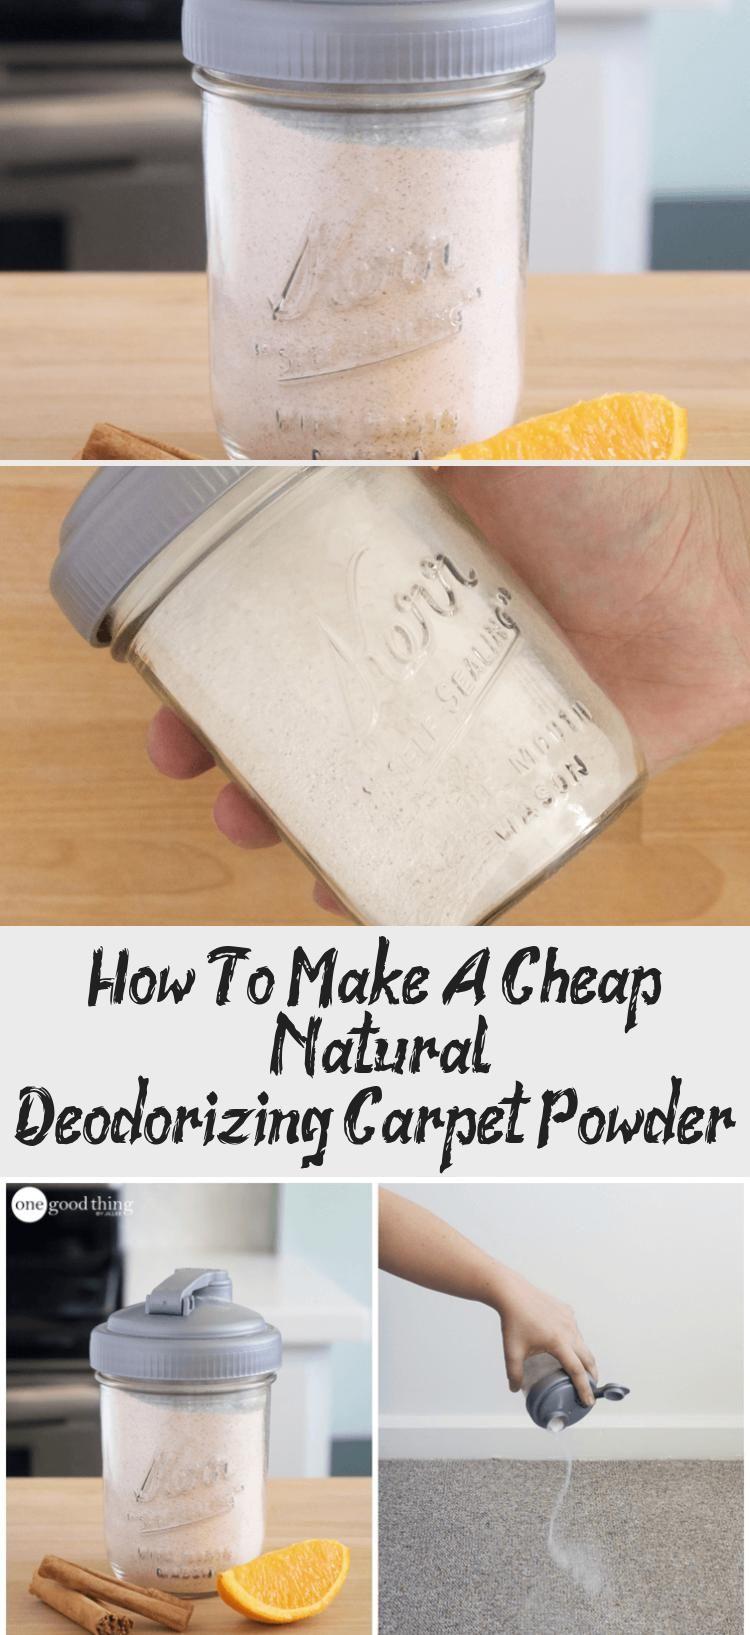 How To Make A Cheap Natural Deodorizing Carpet Powder In 2020